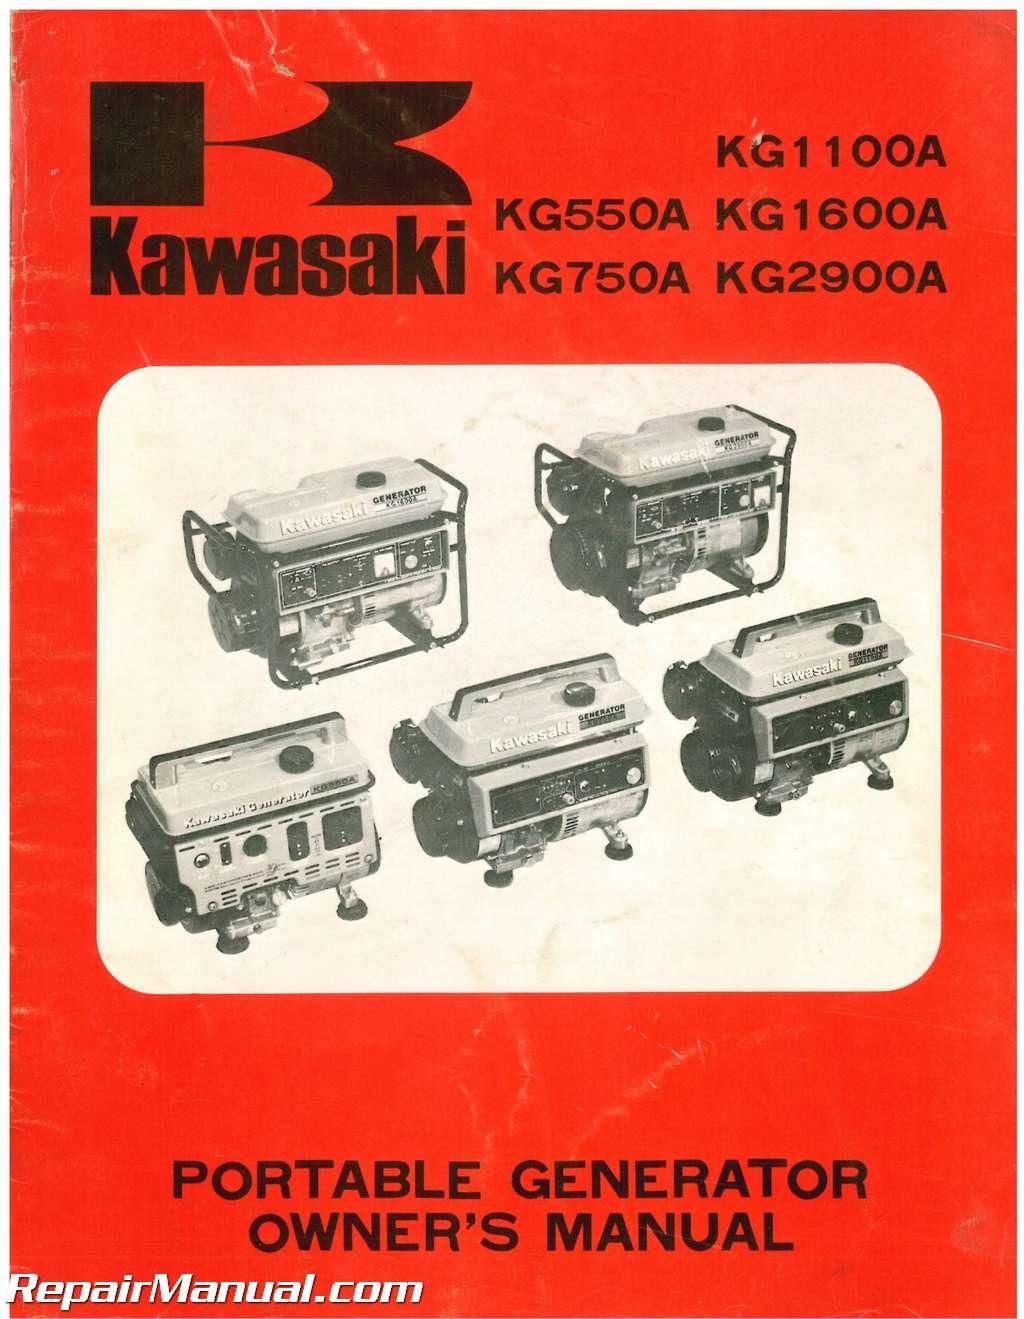 Kawasaki Kg A Kg A Kg A Kg A Kg A Portable Generator Owners Manual